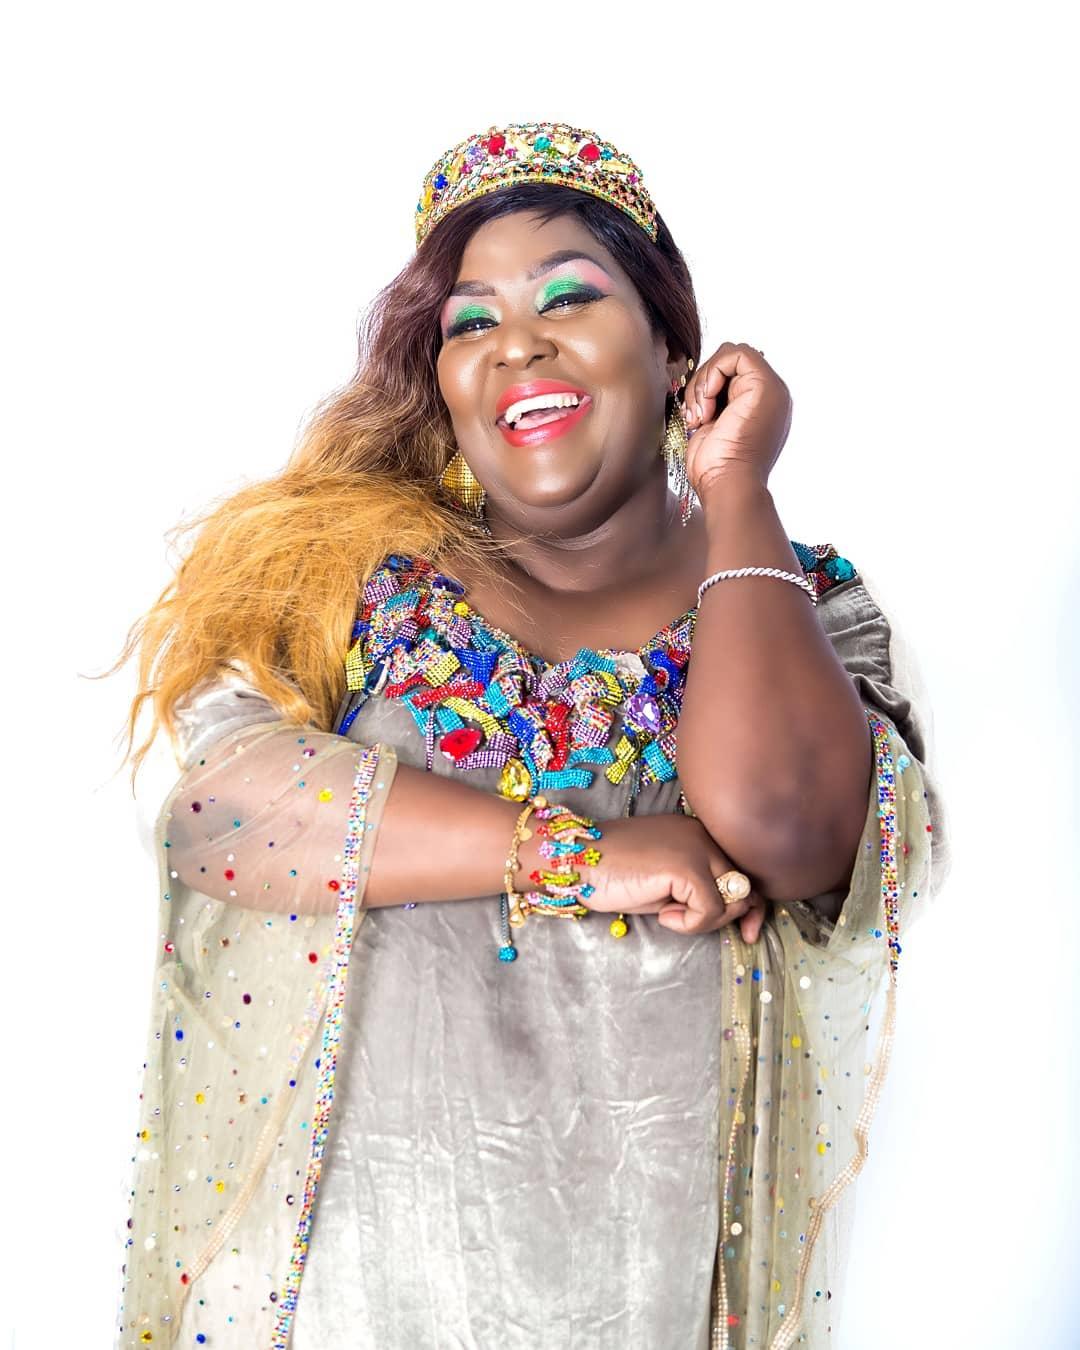 Khadija Kopa avifumbia macho vibeniten, kisa? - Bongo5.com